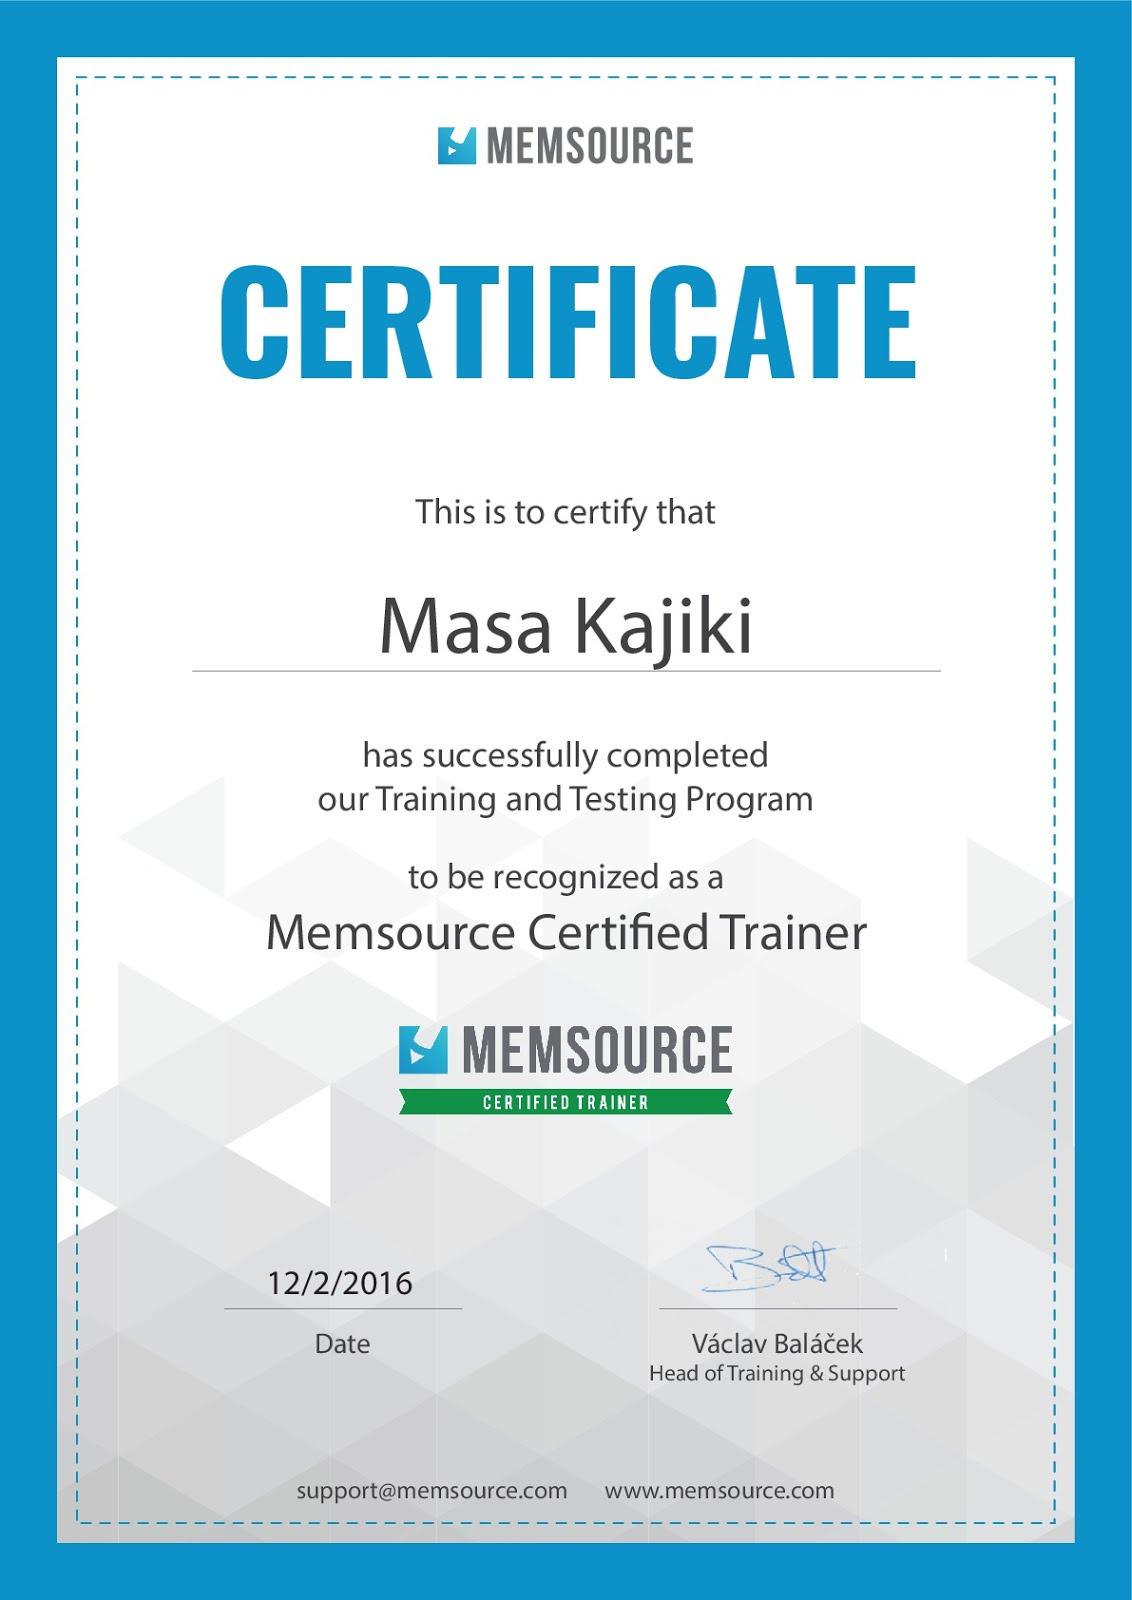 Certified Memsource Trainer/ Masa Kajiki